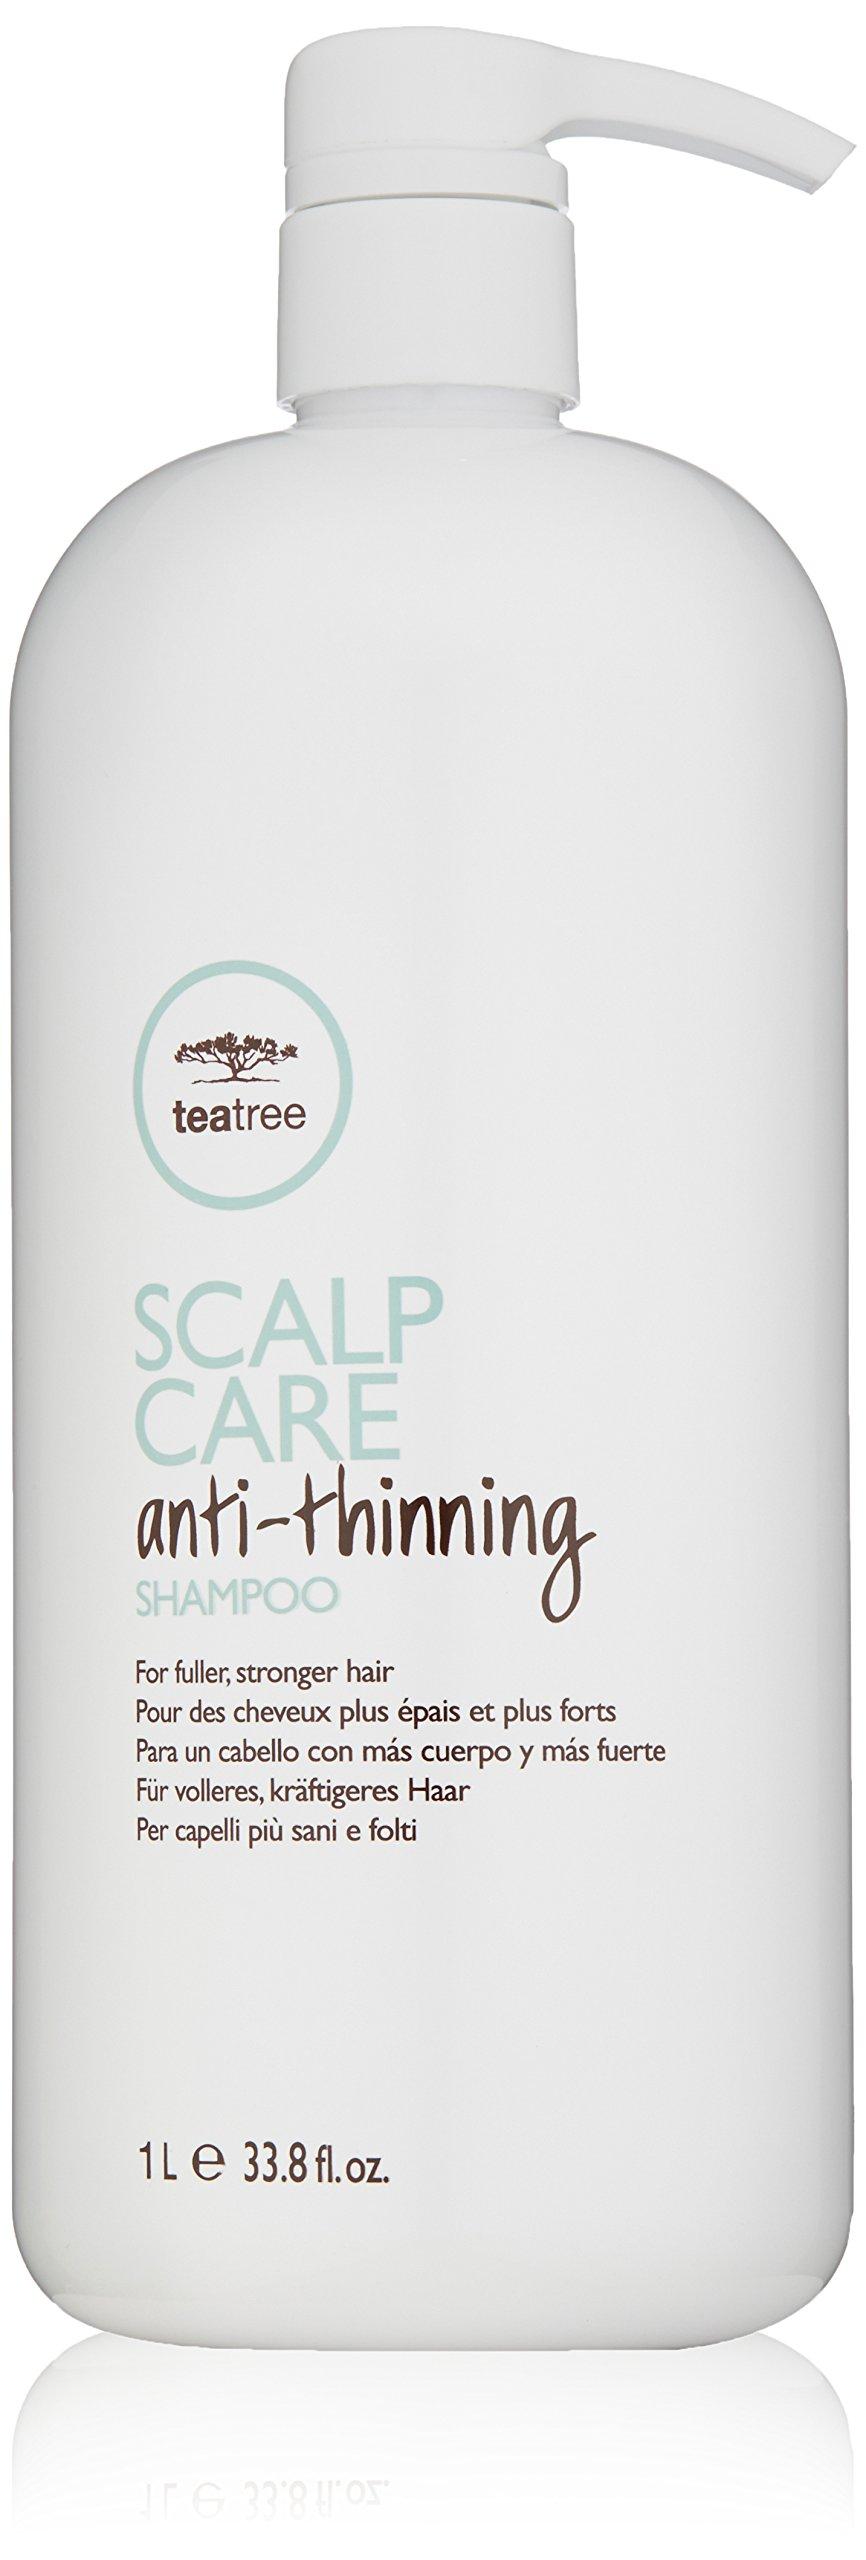 Tea Tree Scalp Care Anti-Thinning Shampoo, 33.8 Fl Oz by Tea Tree